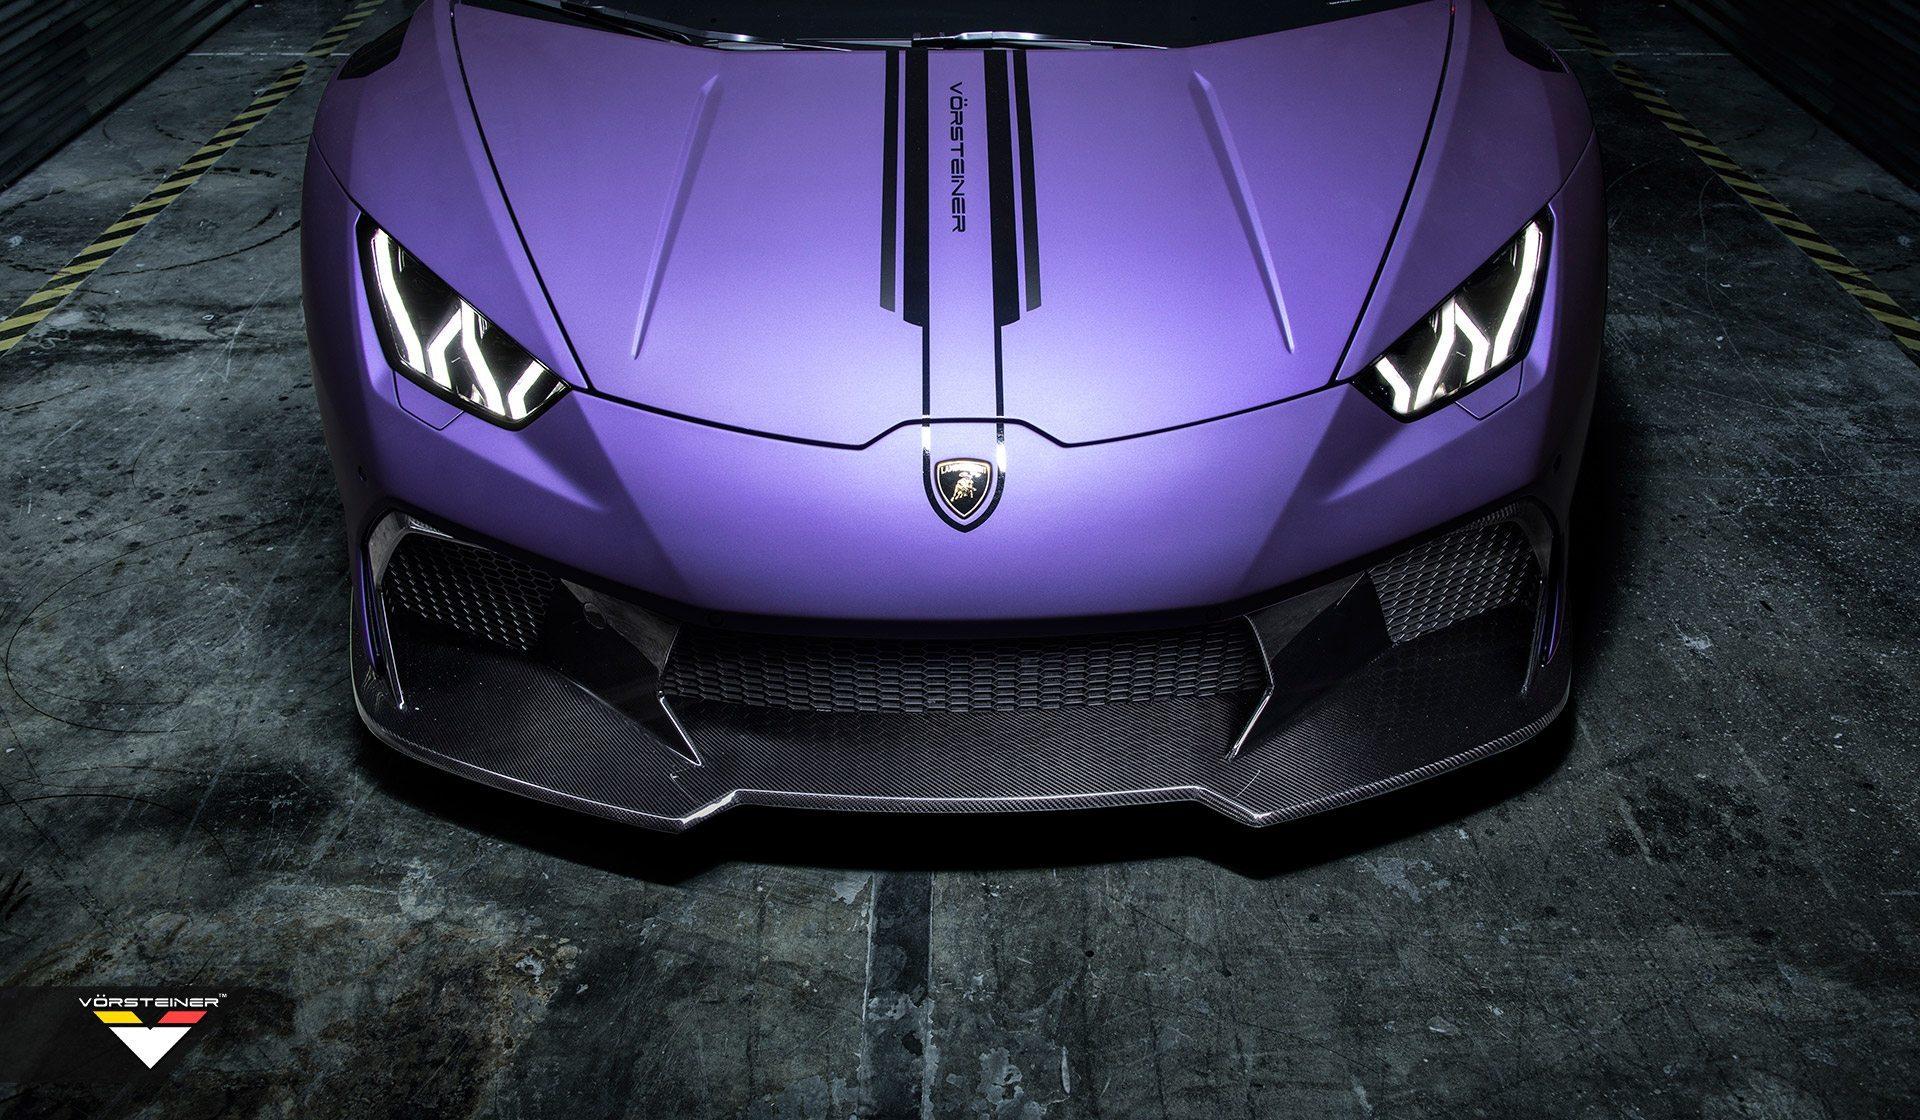 Карбоновый передний бампер и спойлер Novara Style для Lamborghini Huracan